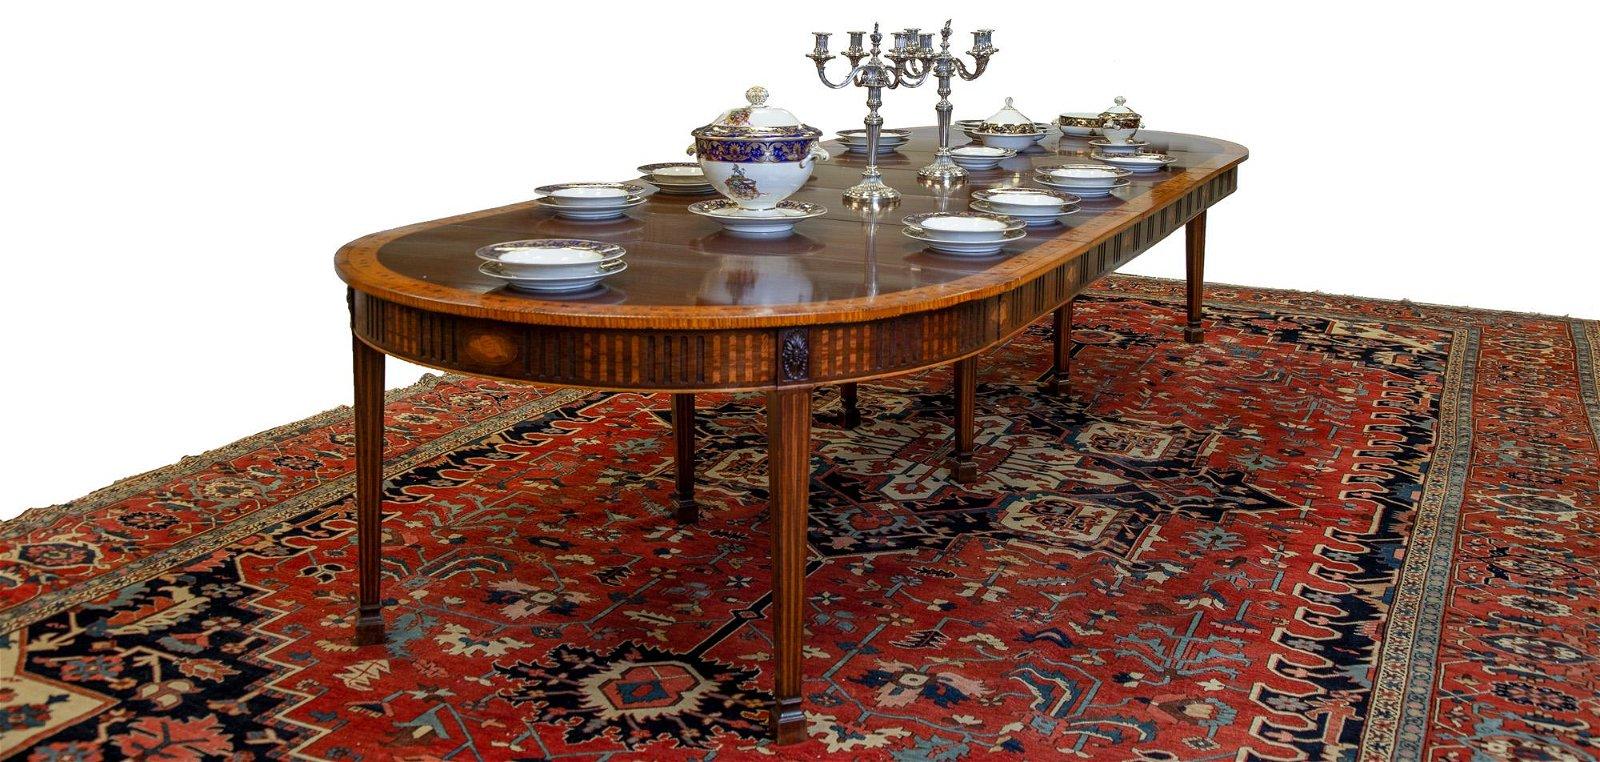 English Hepplewhite Inlaid Accordion Dining Table